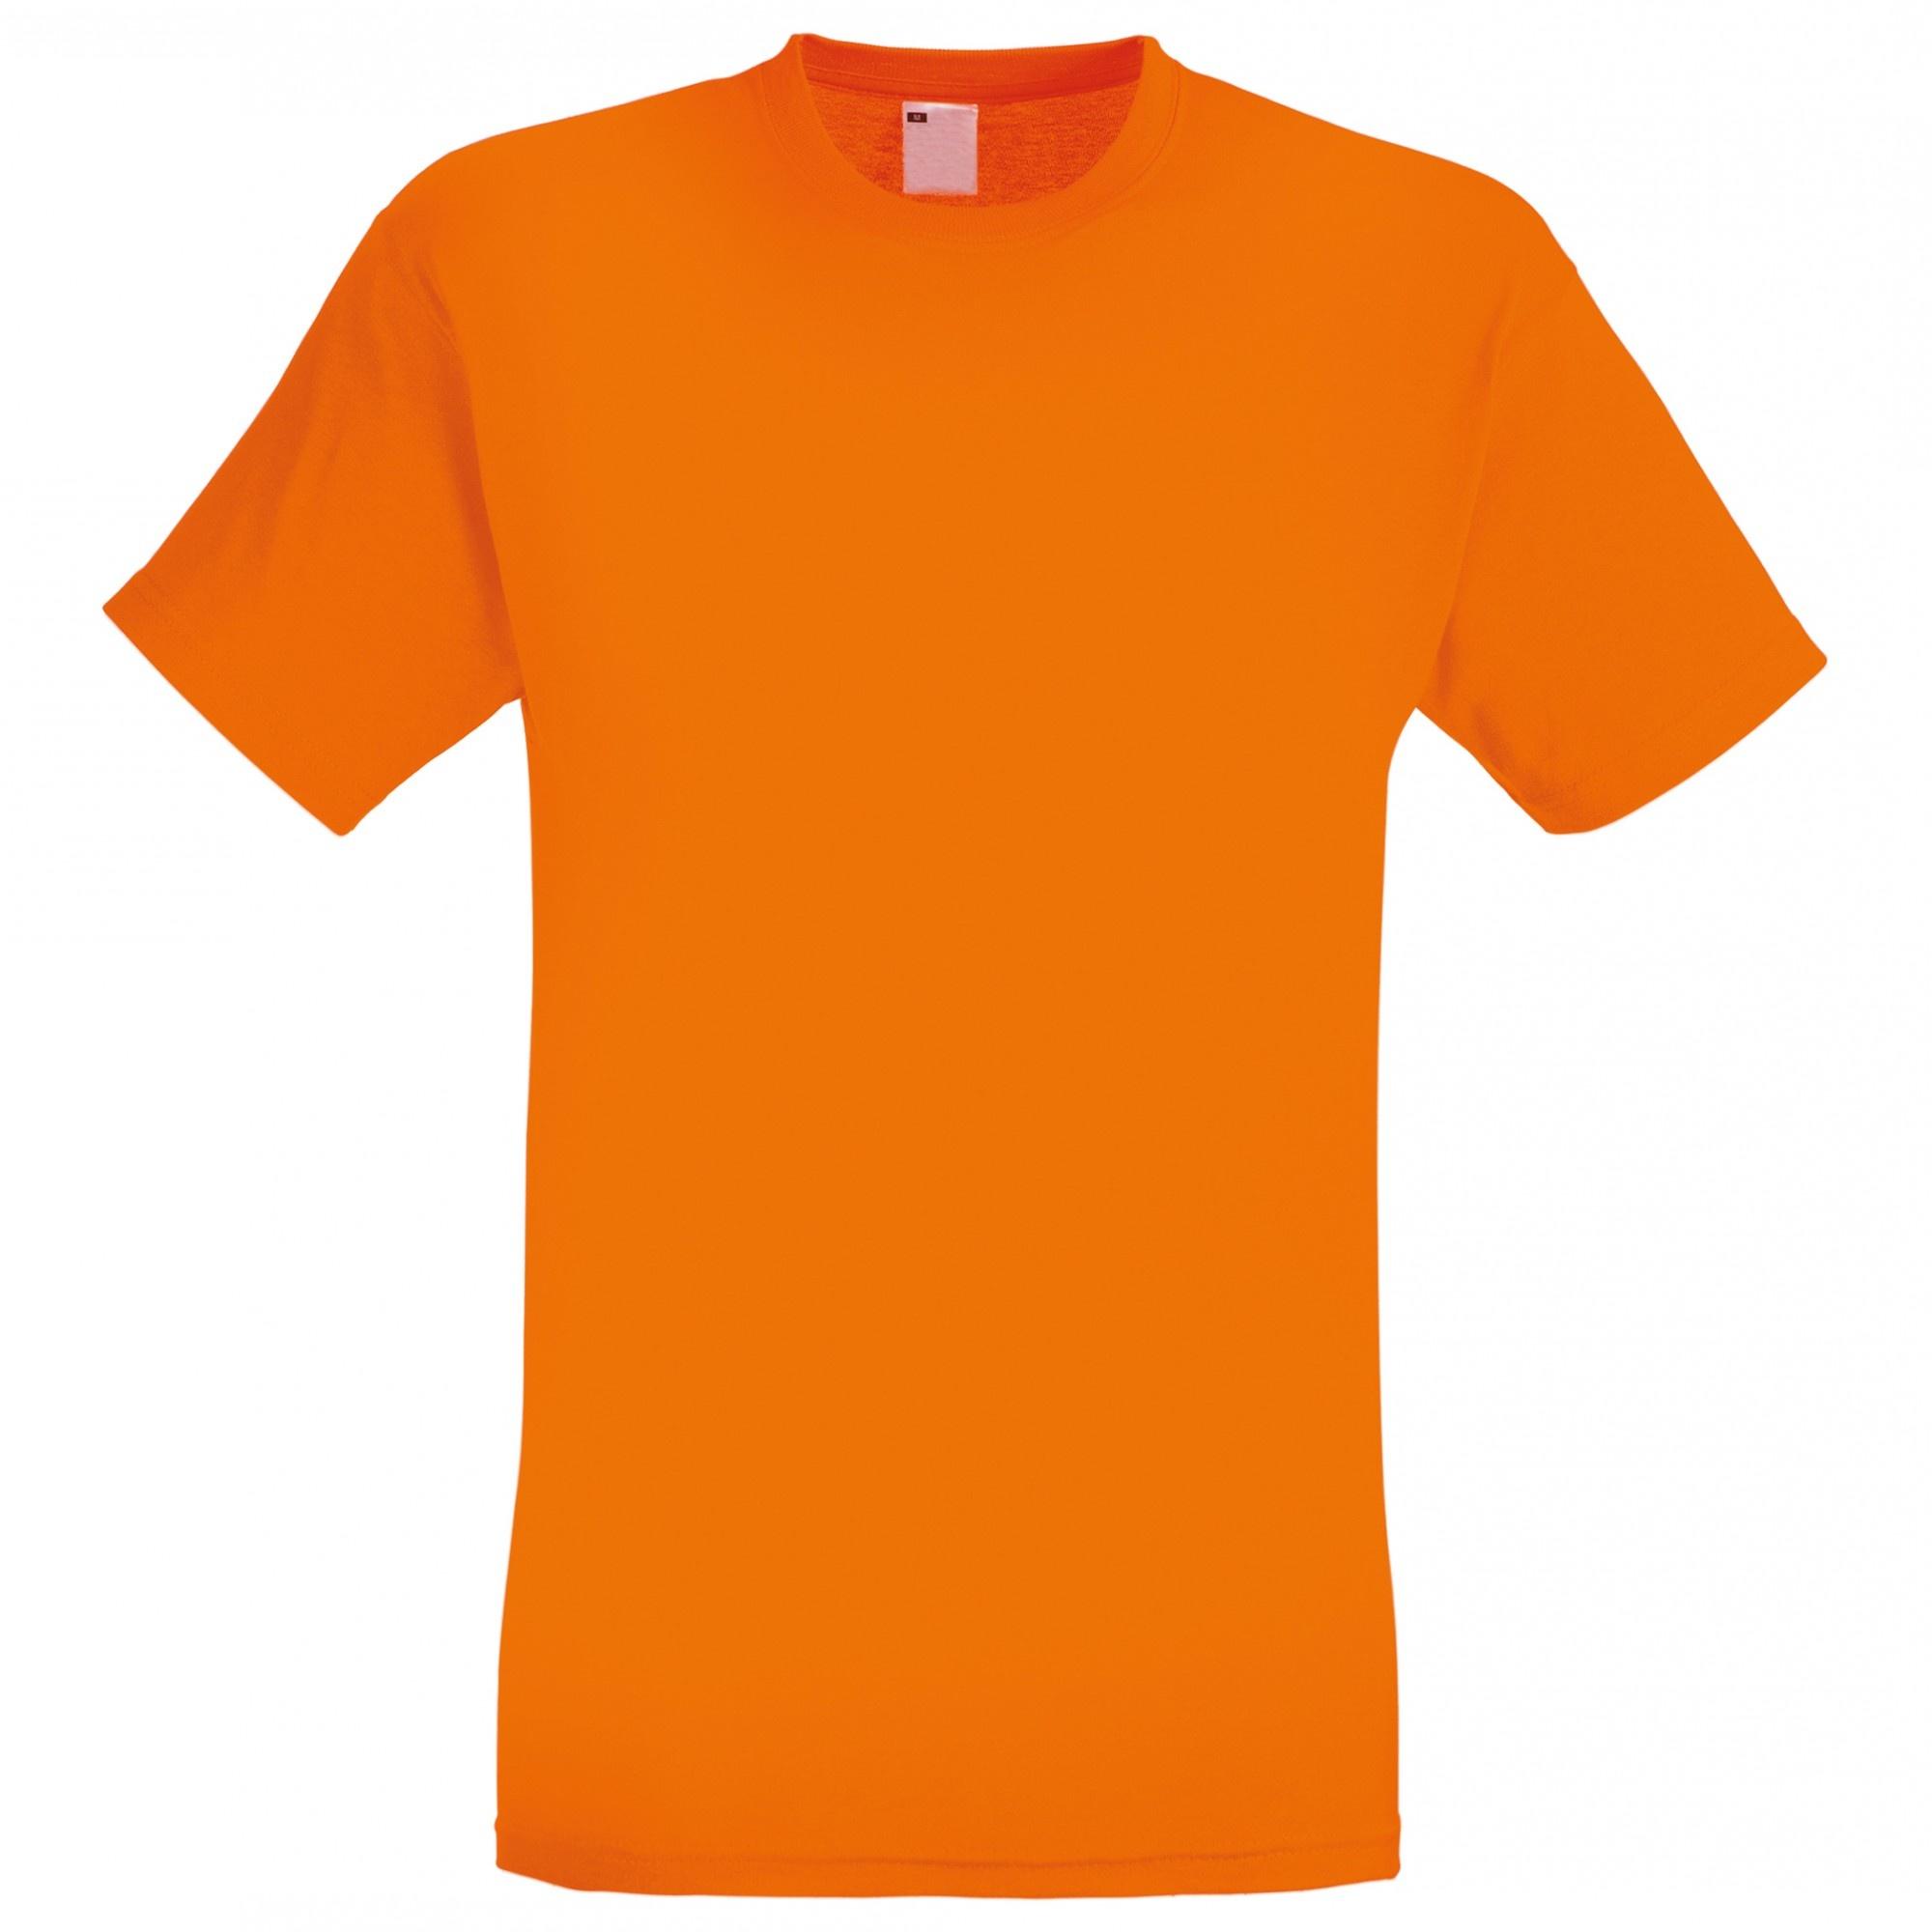 Mens Short Sleeve Casual T-Shirt (Small) (Bright Orange)